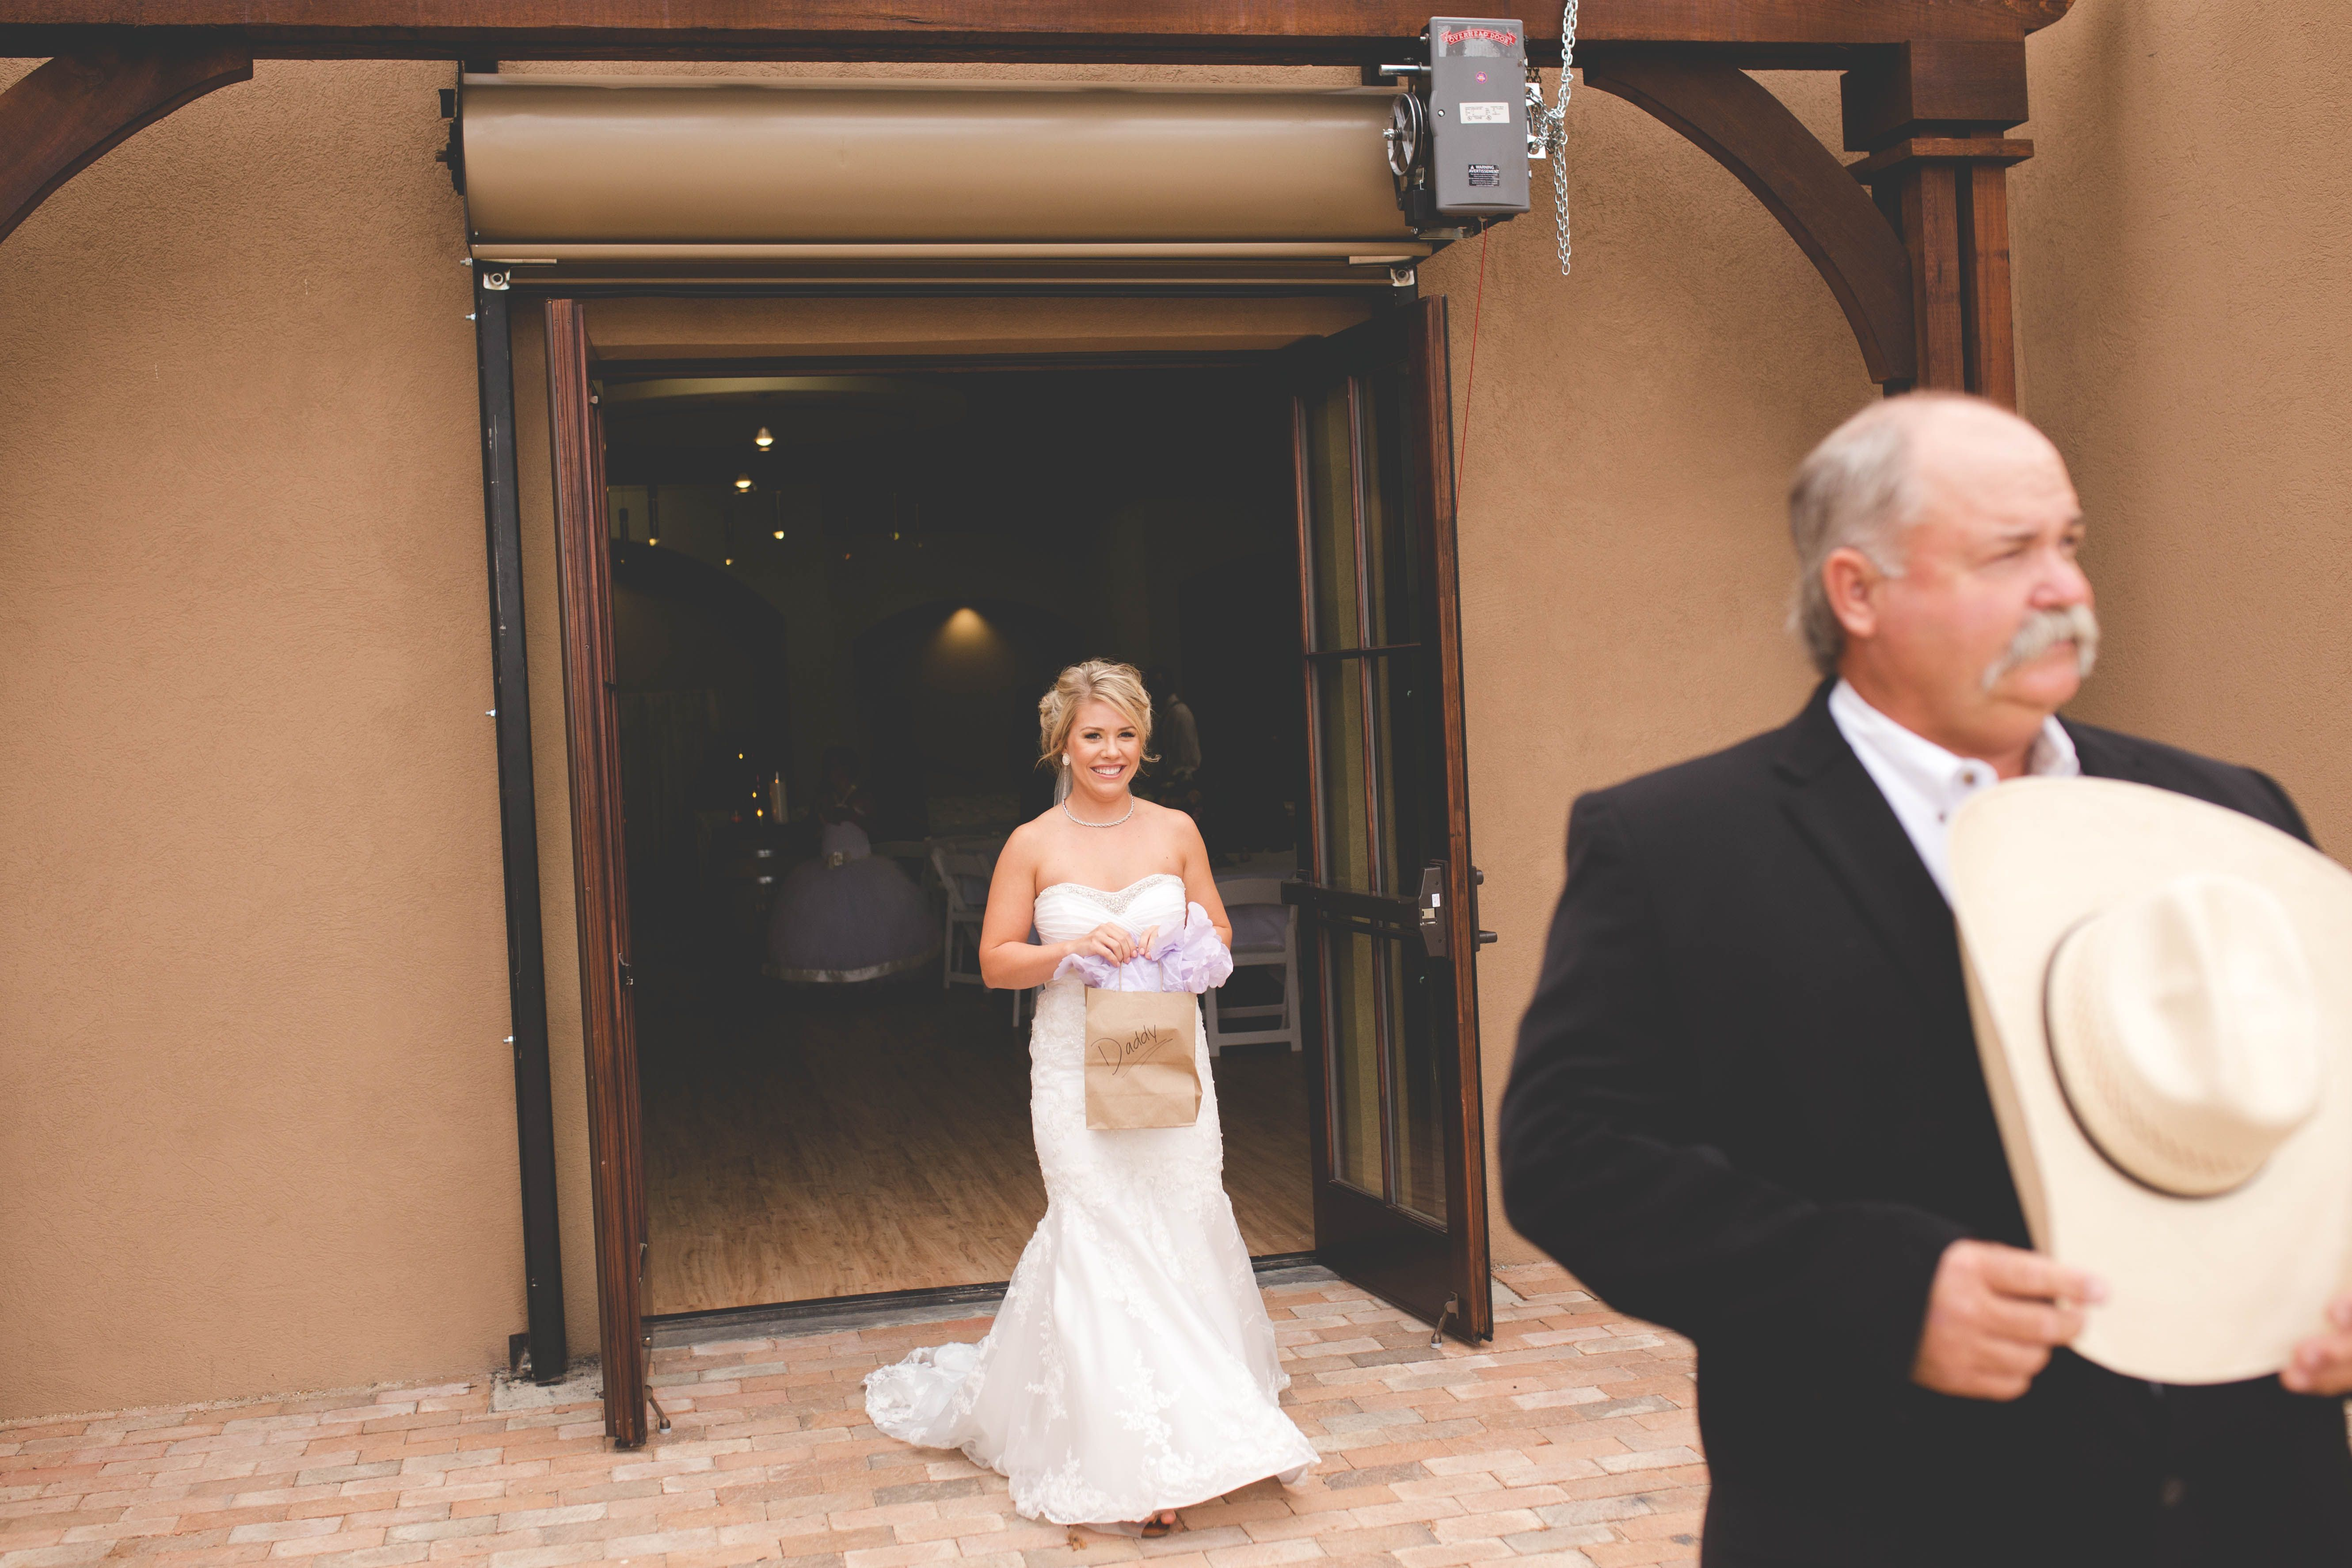 Wedding dresses in lubbock tx at exclusive wedding decoration and beautiful llano estacado winery wedding lubbock tx winery wedding texas wineries vineyard wedding ombrellifo Images